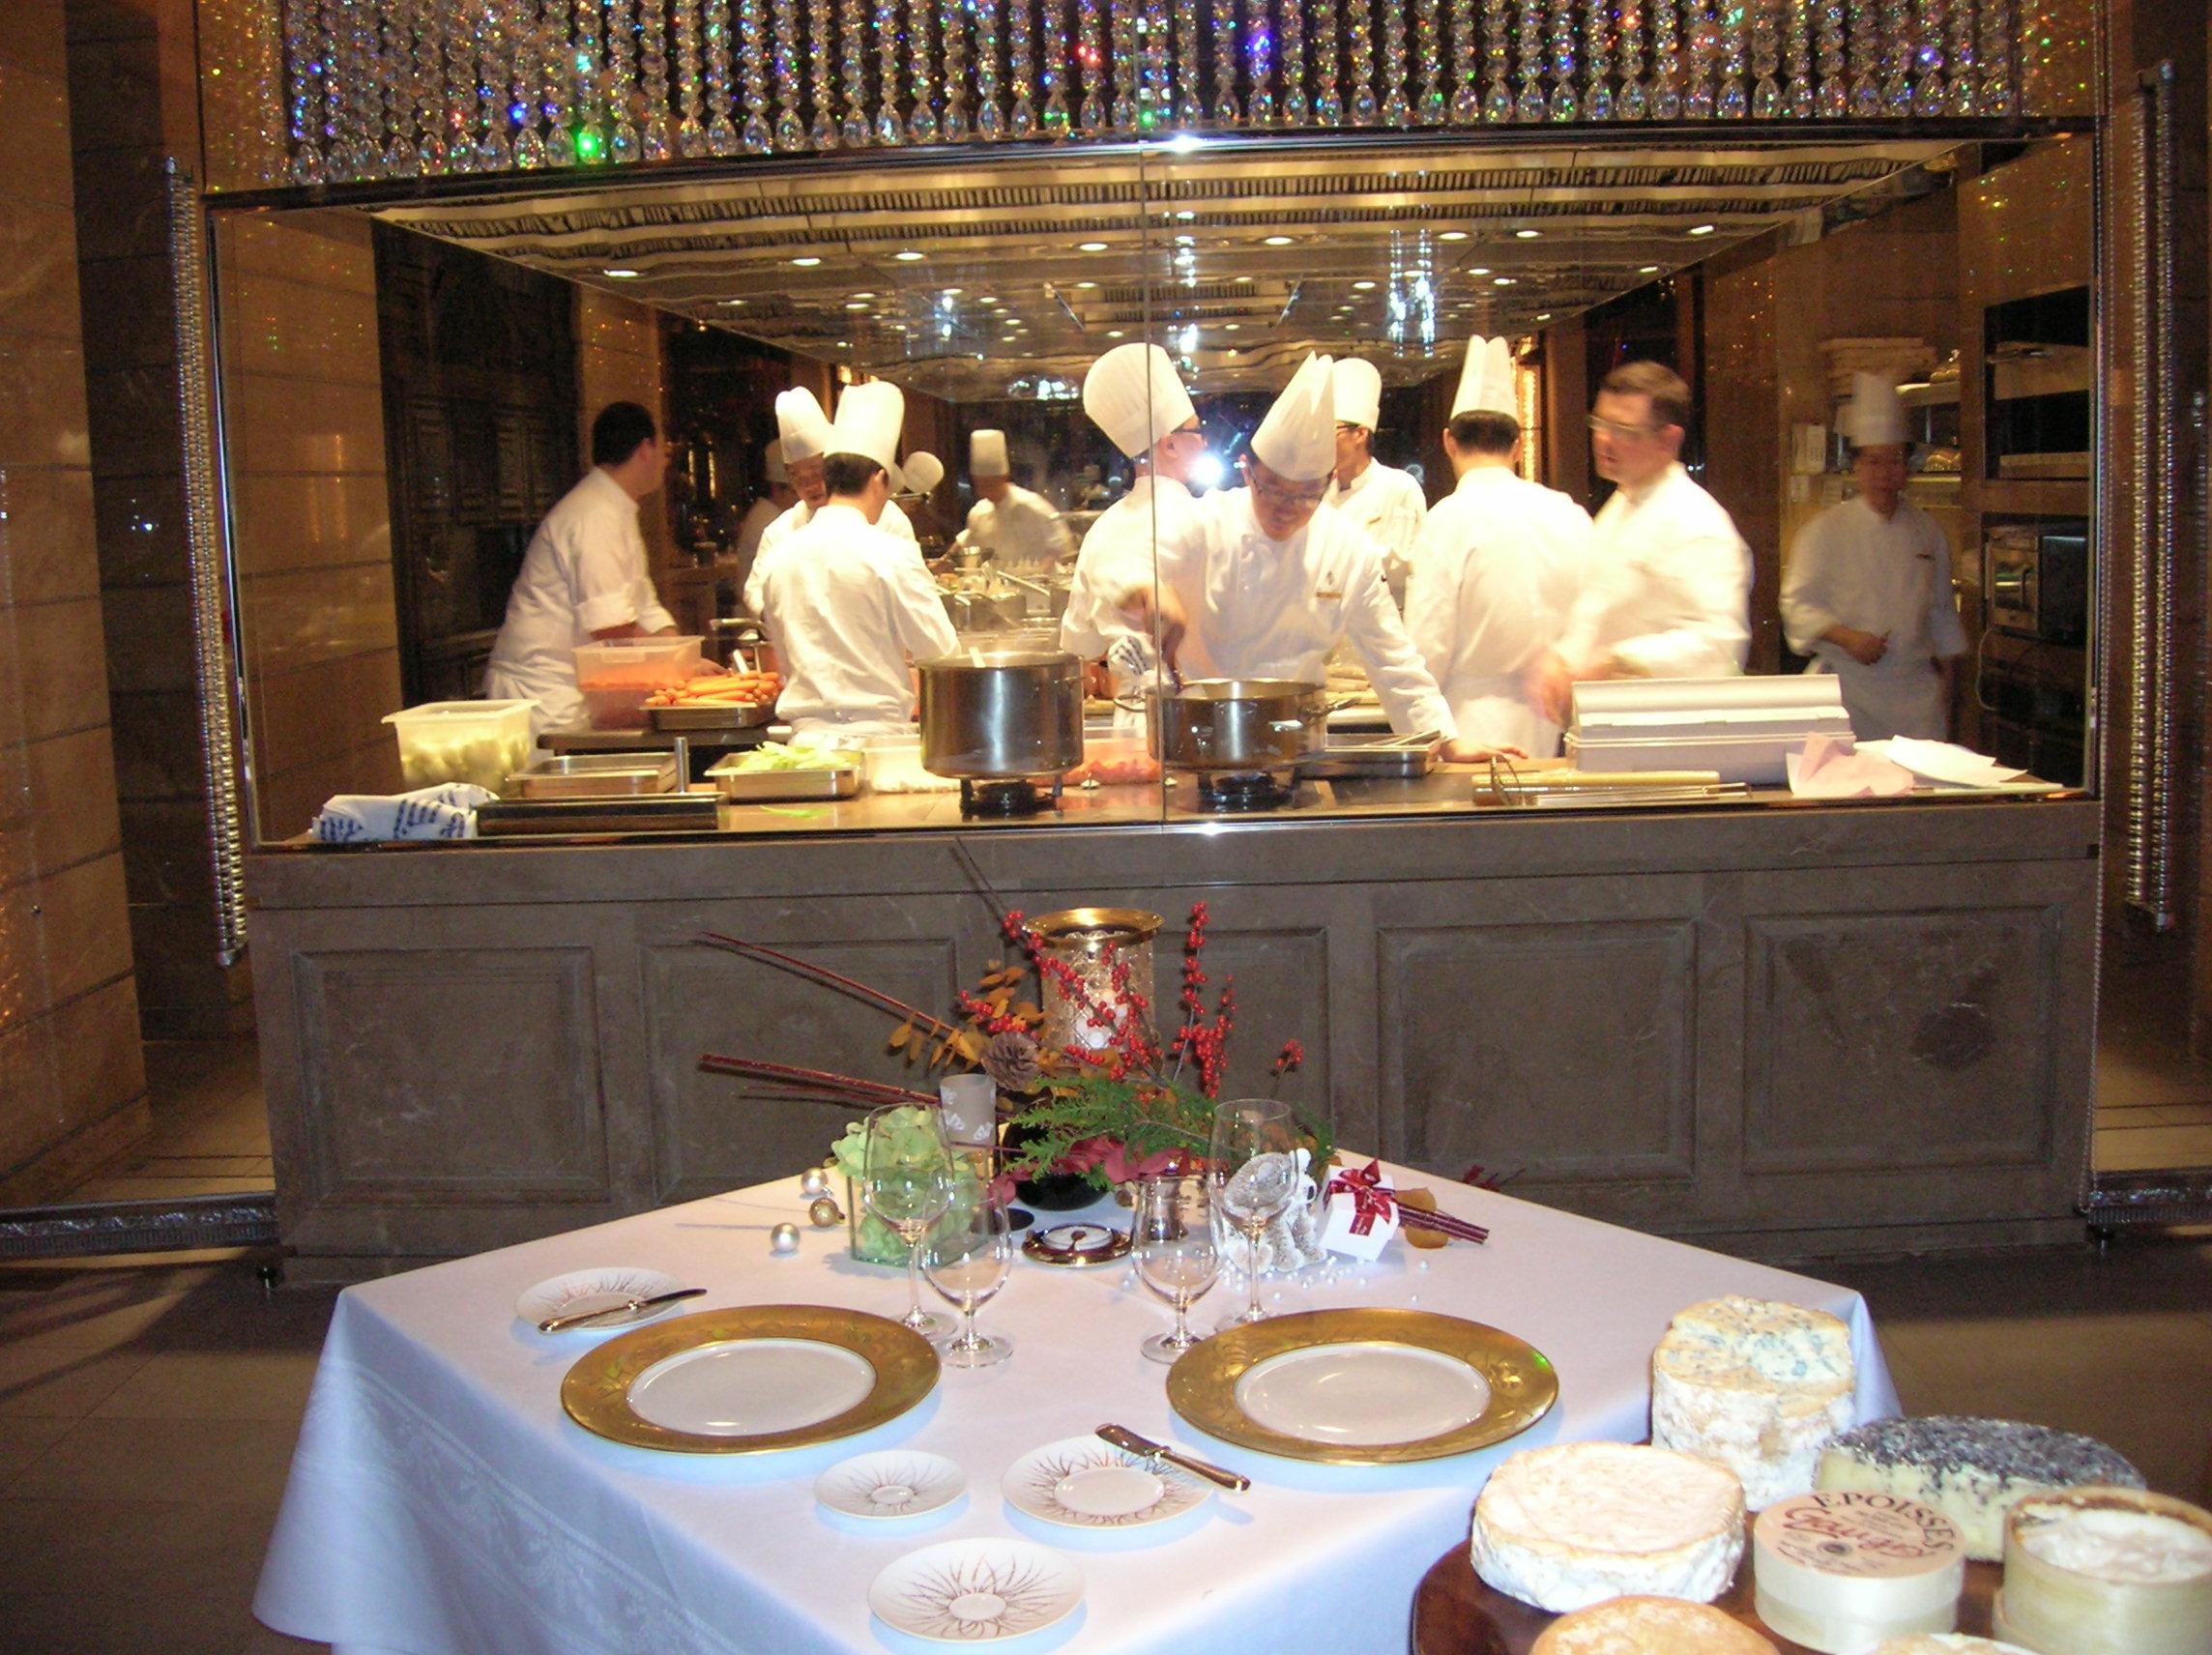 File:Caprice open kitchen.jpg - Wikimedia Commons